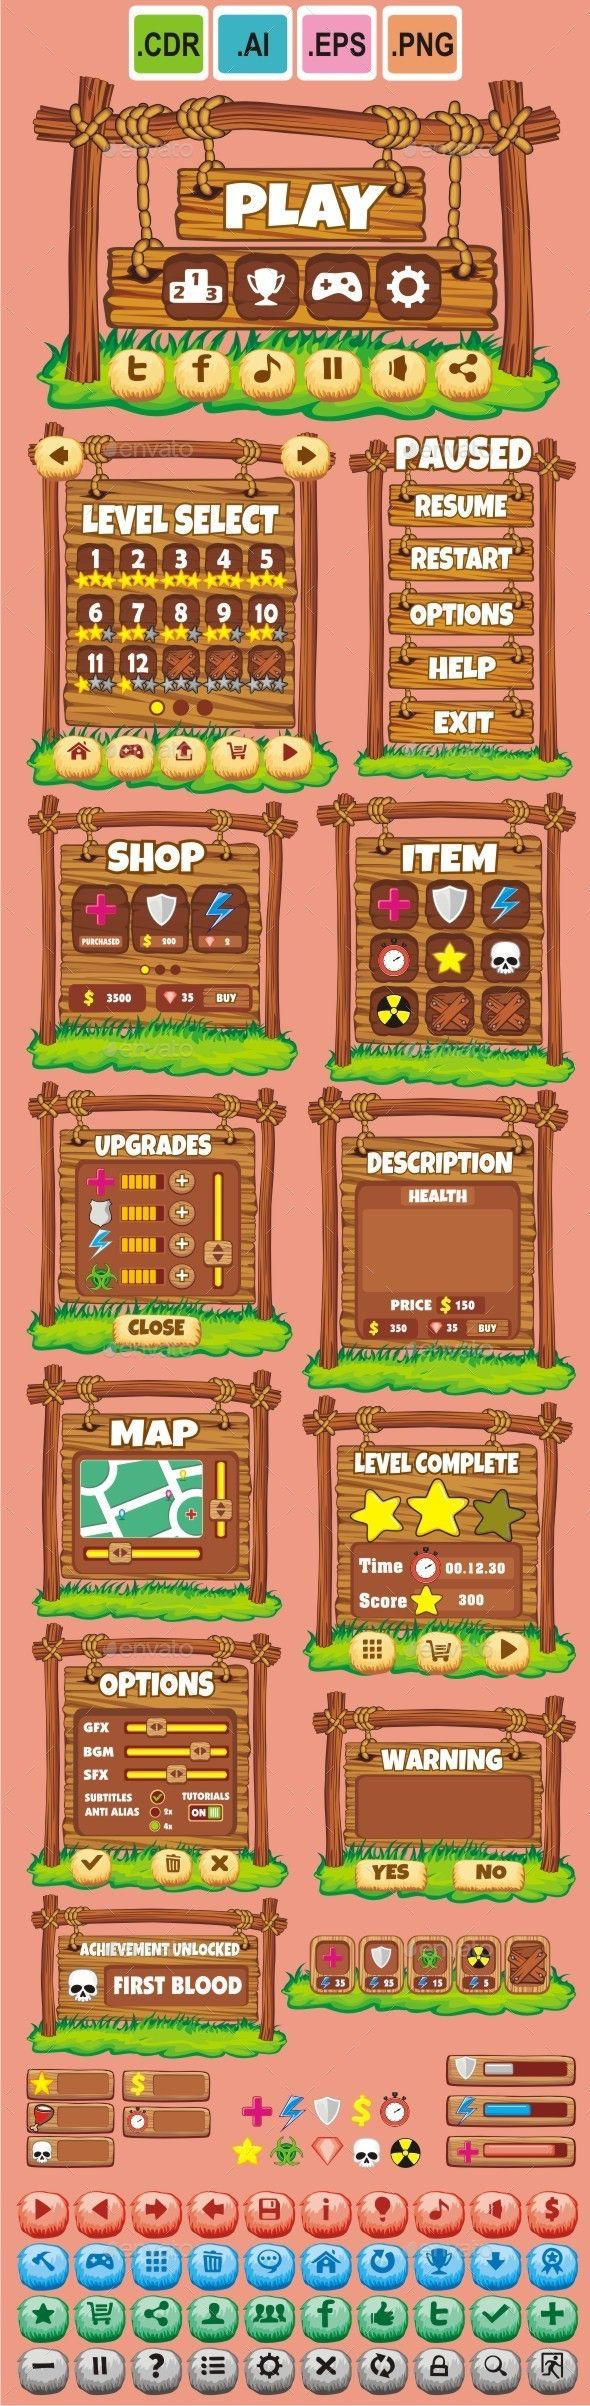 Cartoon Game GUI Pack Vector EPS, AI Illustrator. Download here: https://graphicriver.net/item/cartoon-game-gui-pack-20/10713924?ref=ksioks